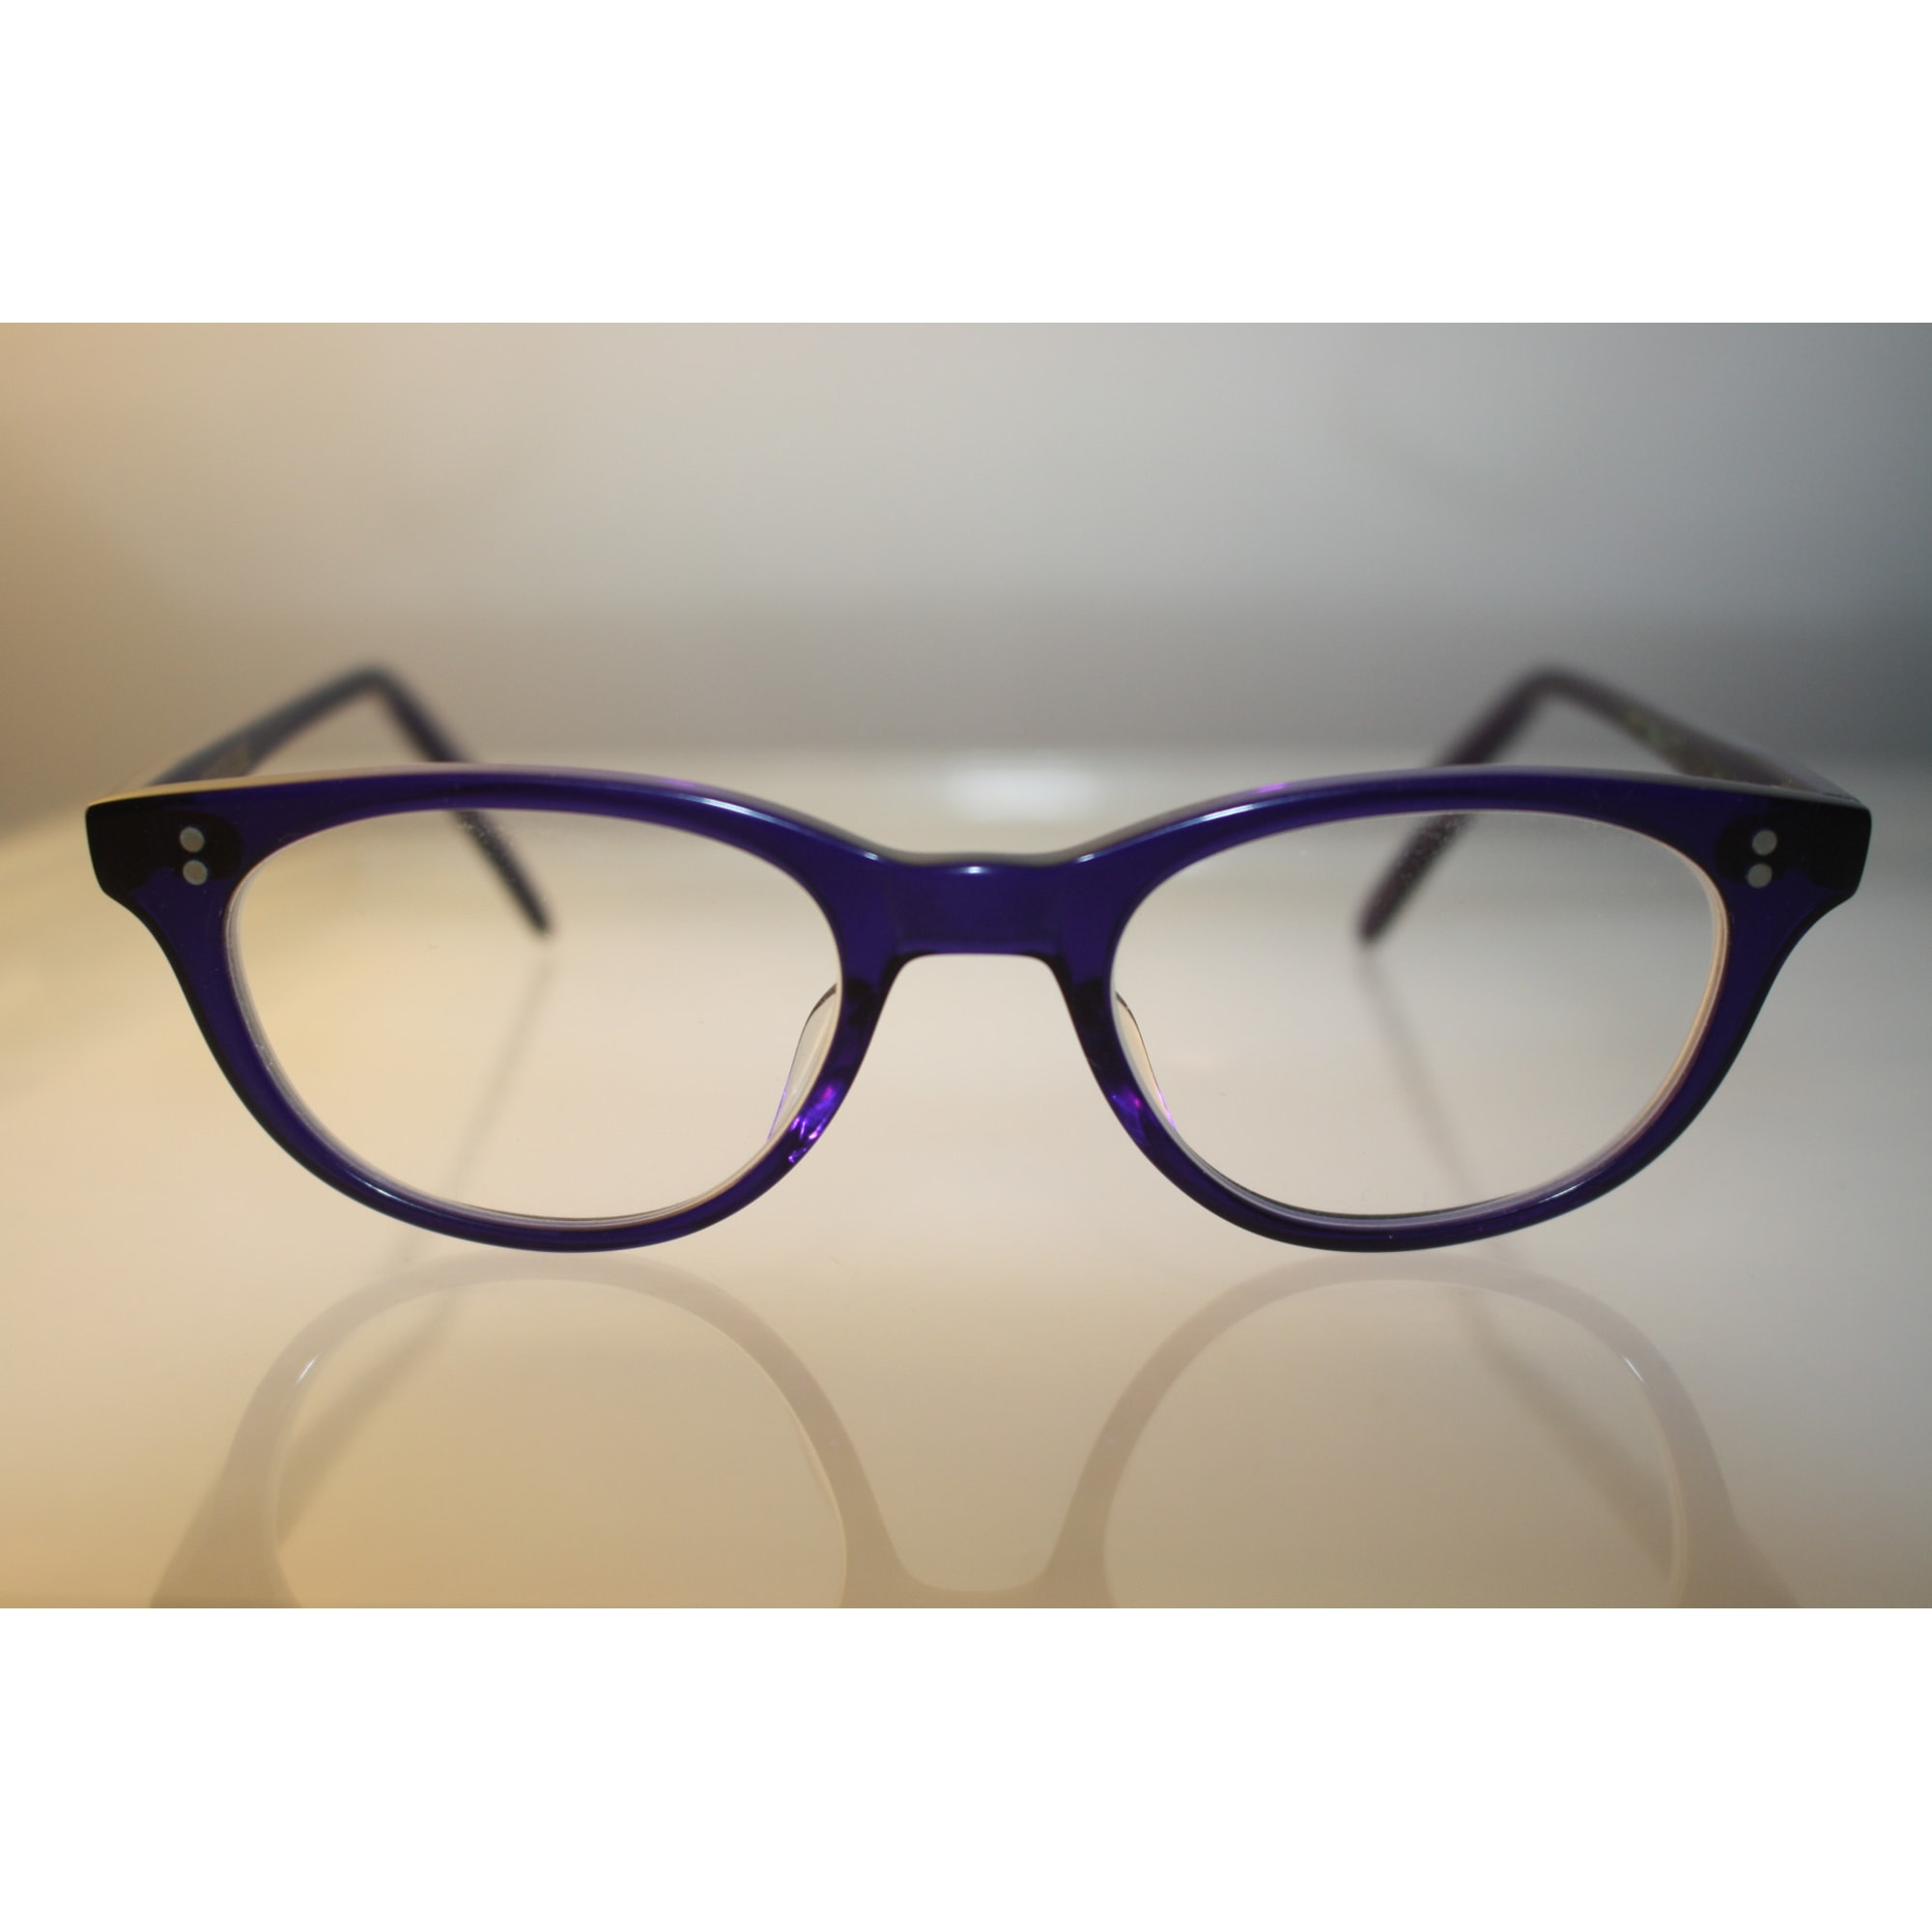 7cbeb1217d75d0 Brillen CUTLER AND GROSS Blau, marineblau, türkisblau